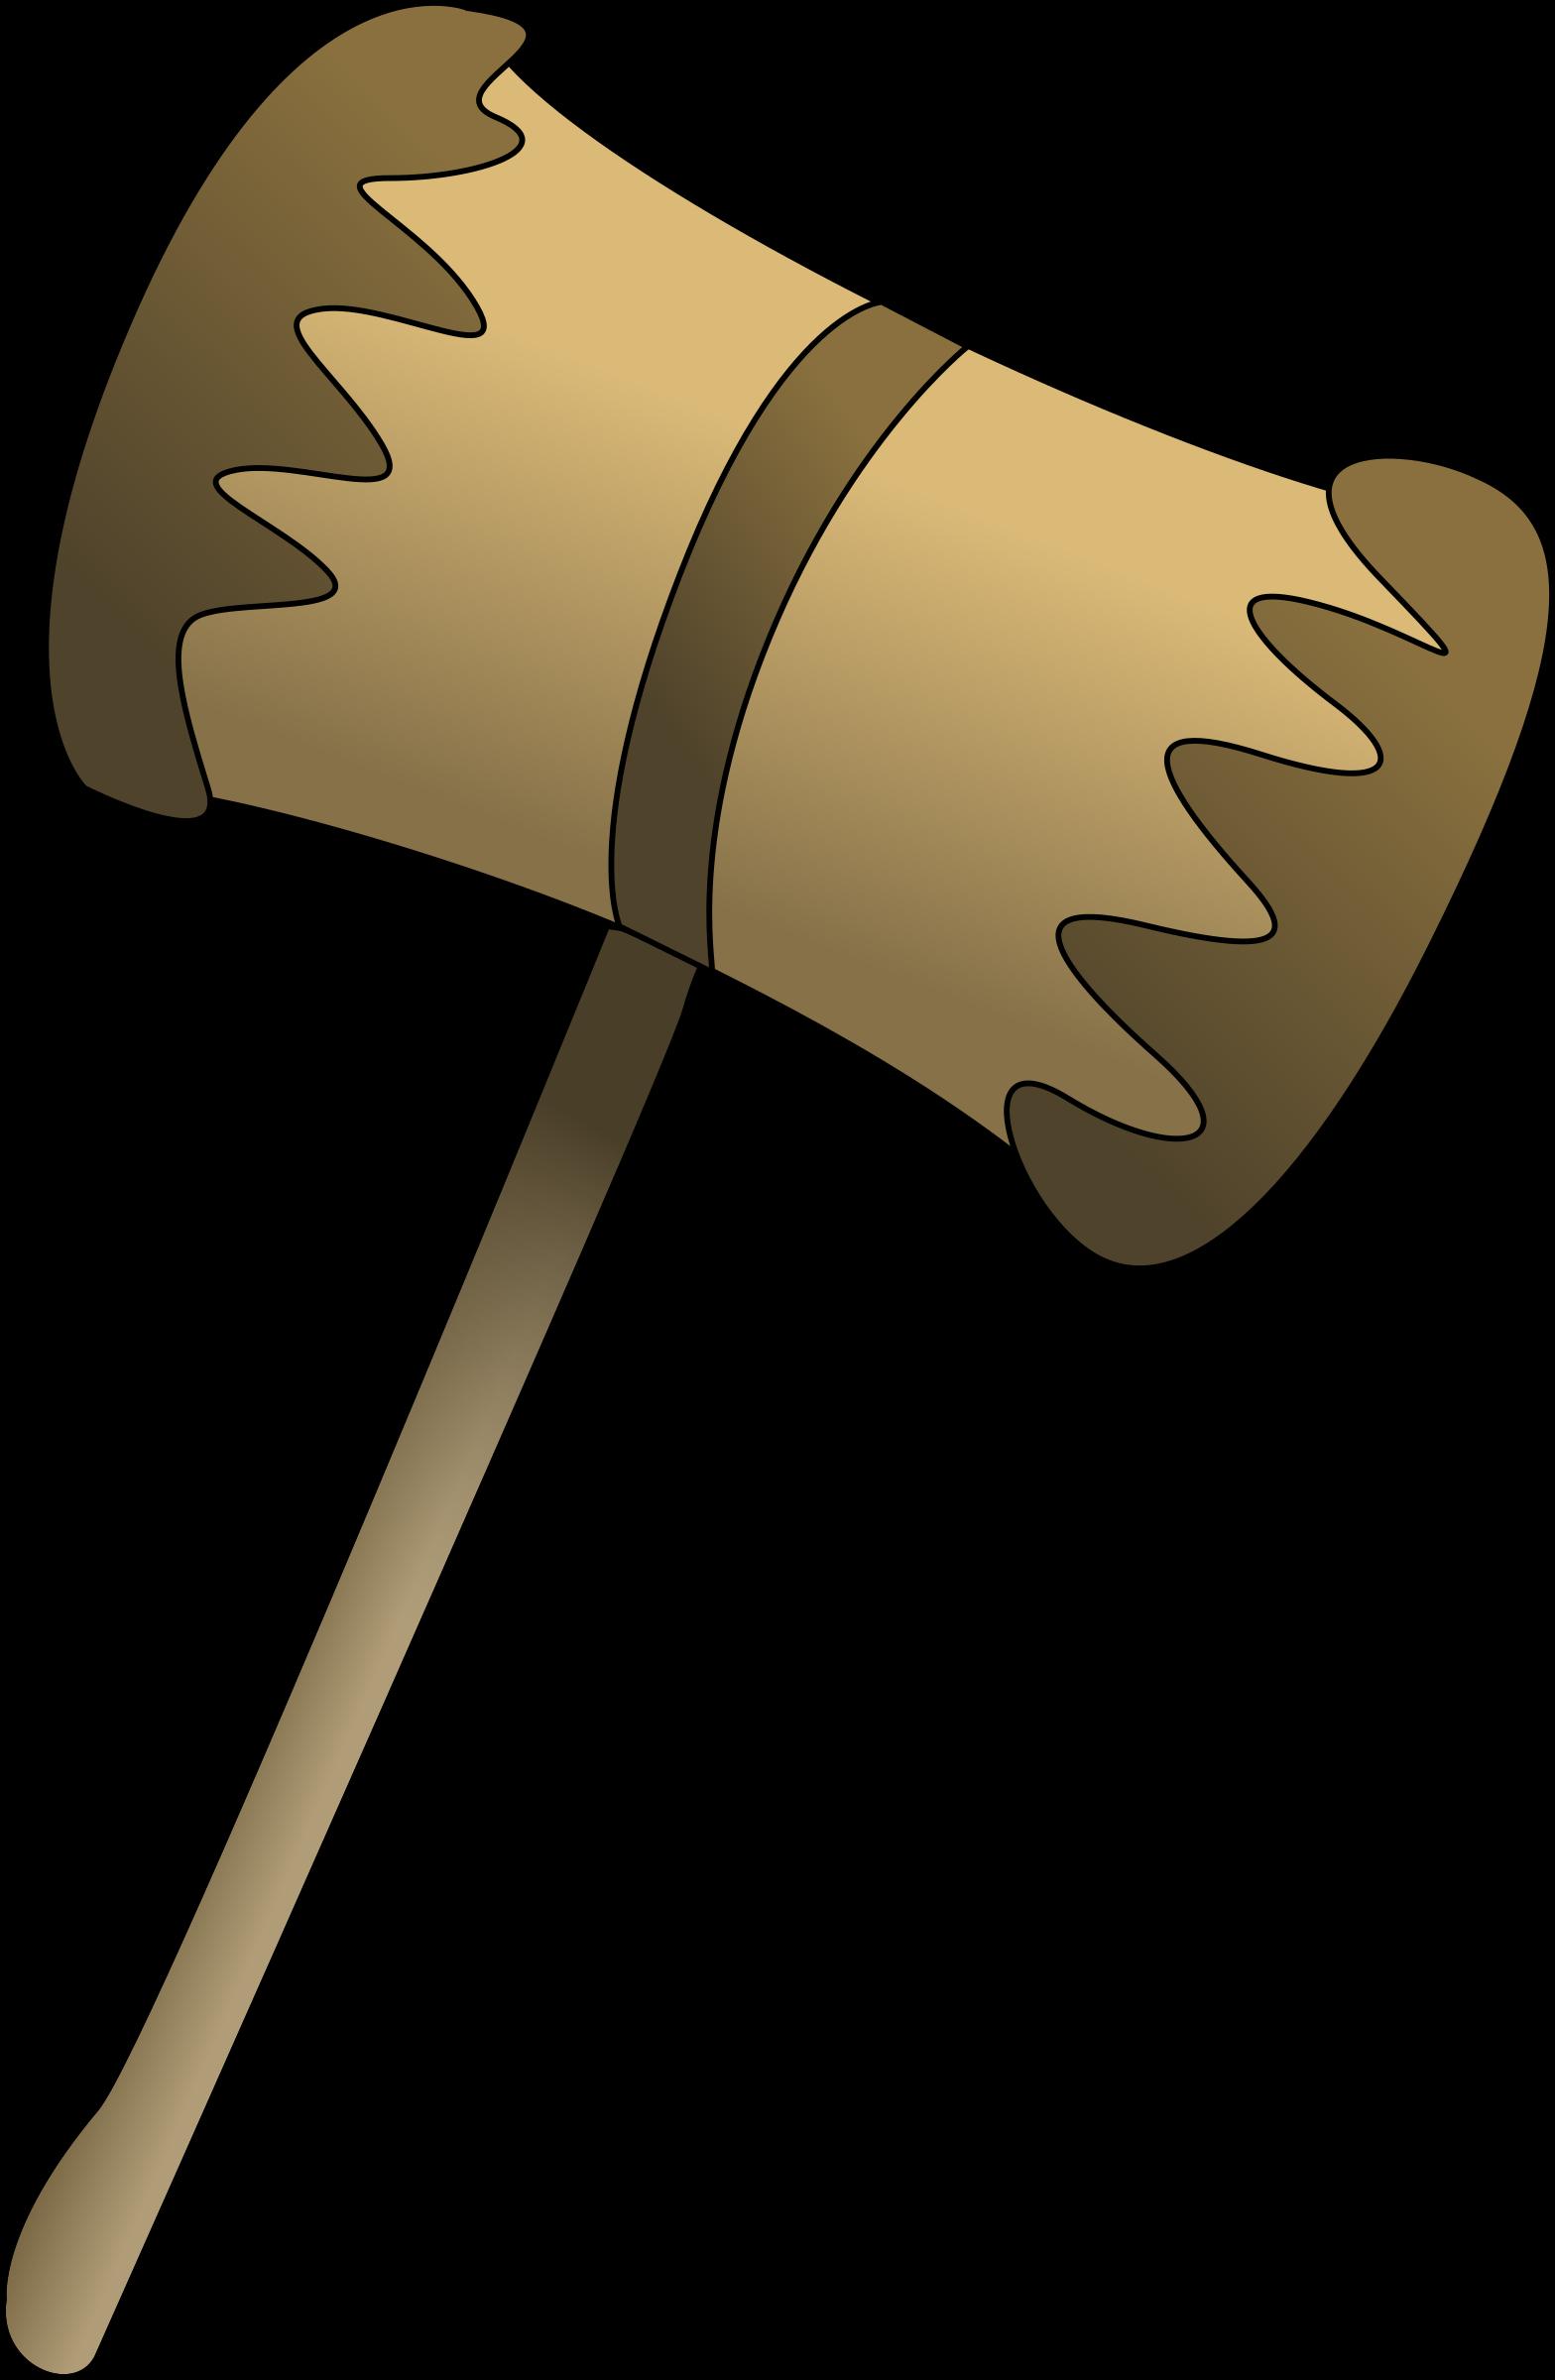 clipart freeuse Mallet big image png. Hammer clipart wooden hammer